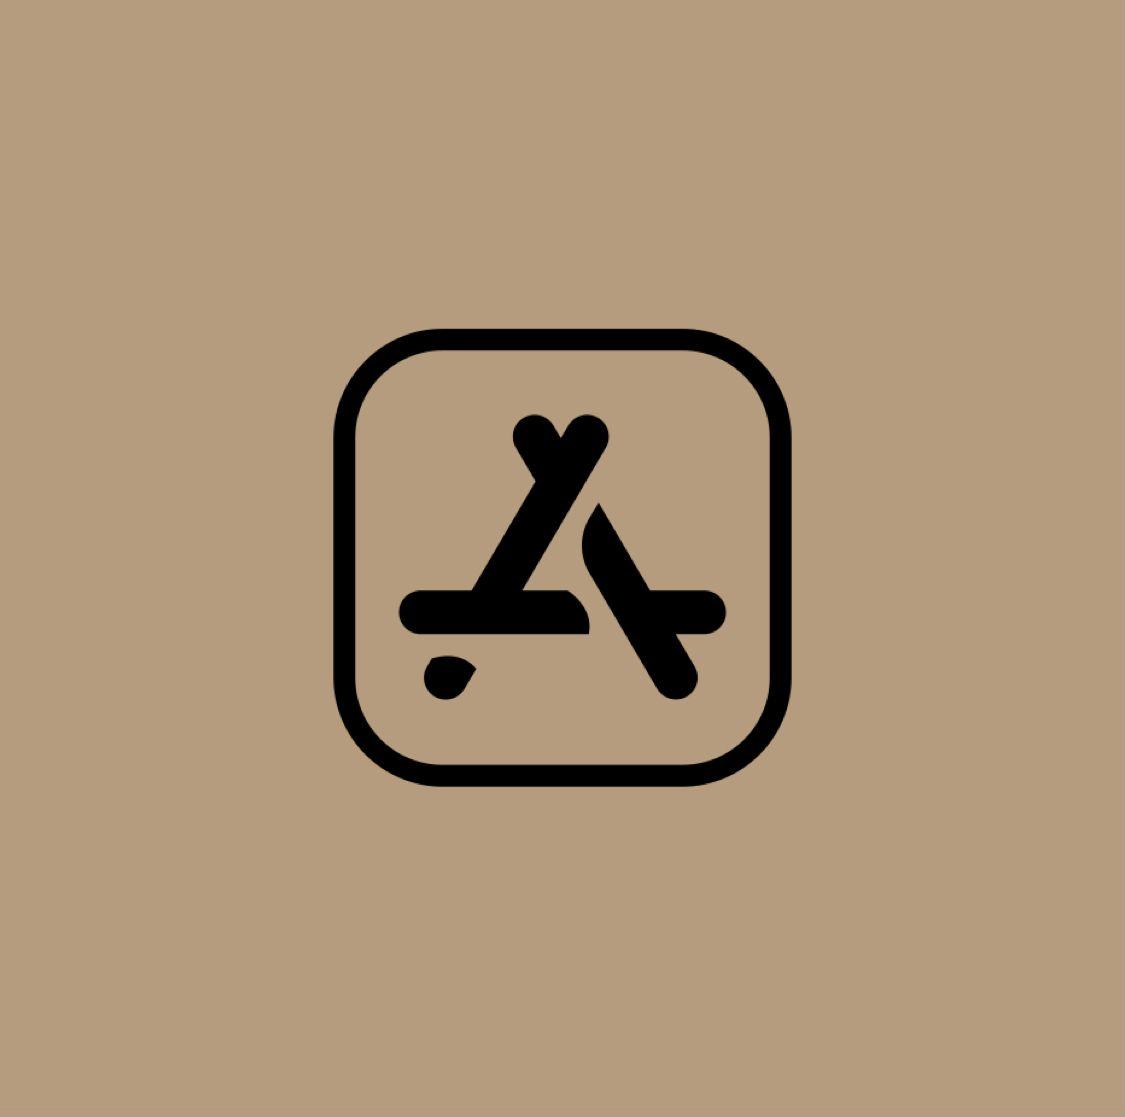 App store icon in 2020 app store icon app logo app covers